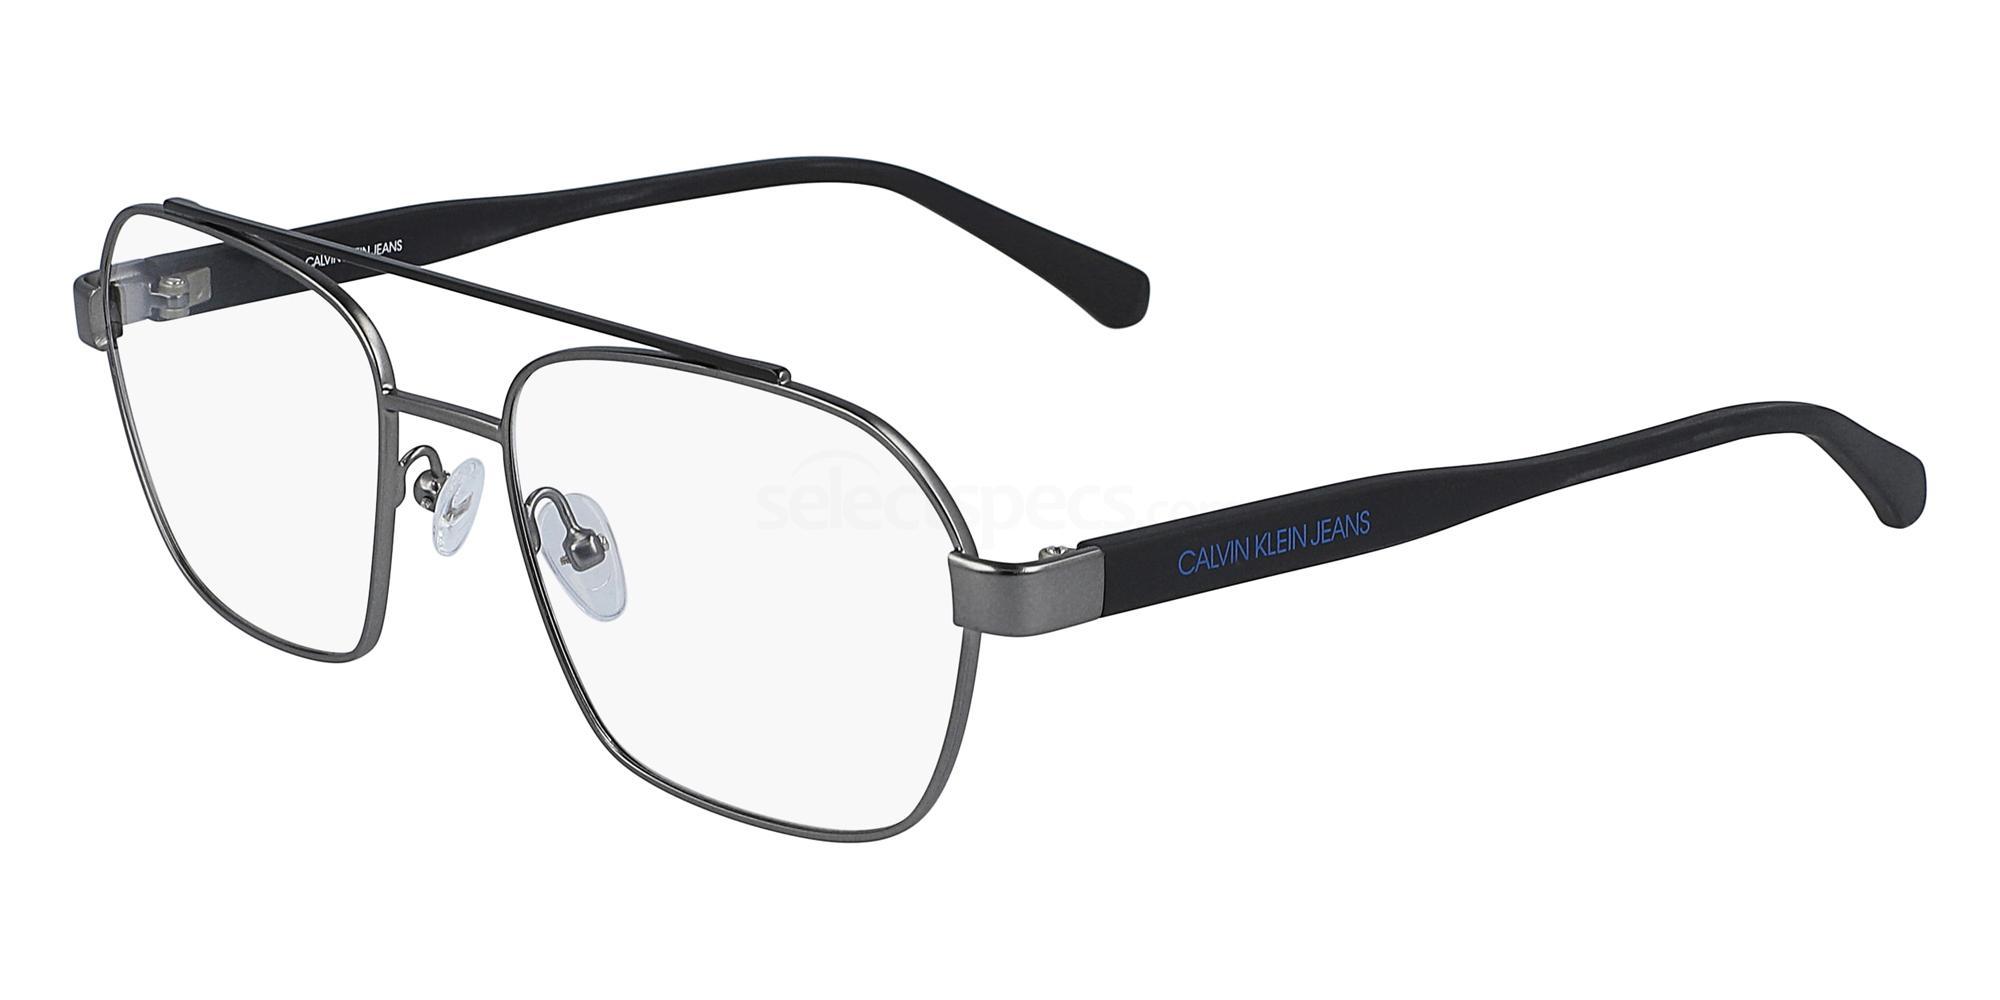 008 CKJ19301 Glasses, Calvin Klein Jeans